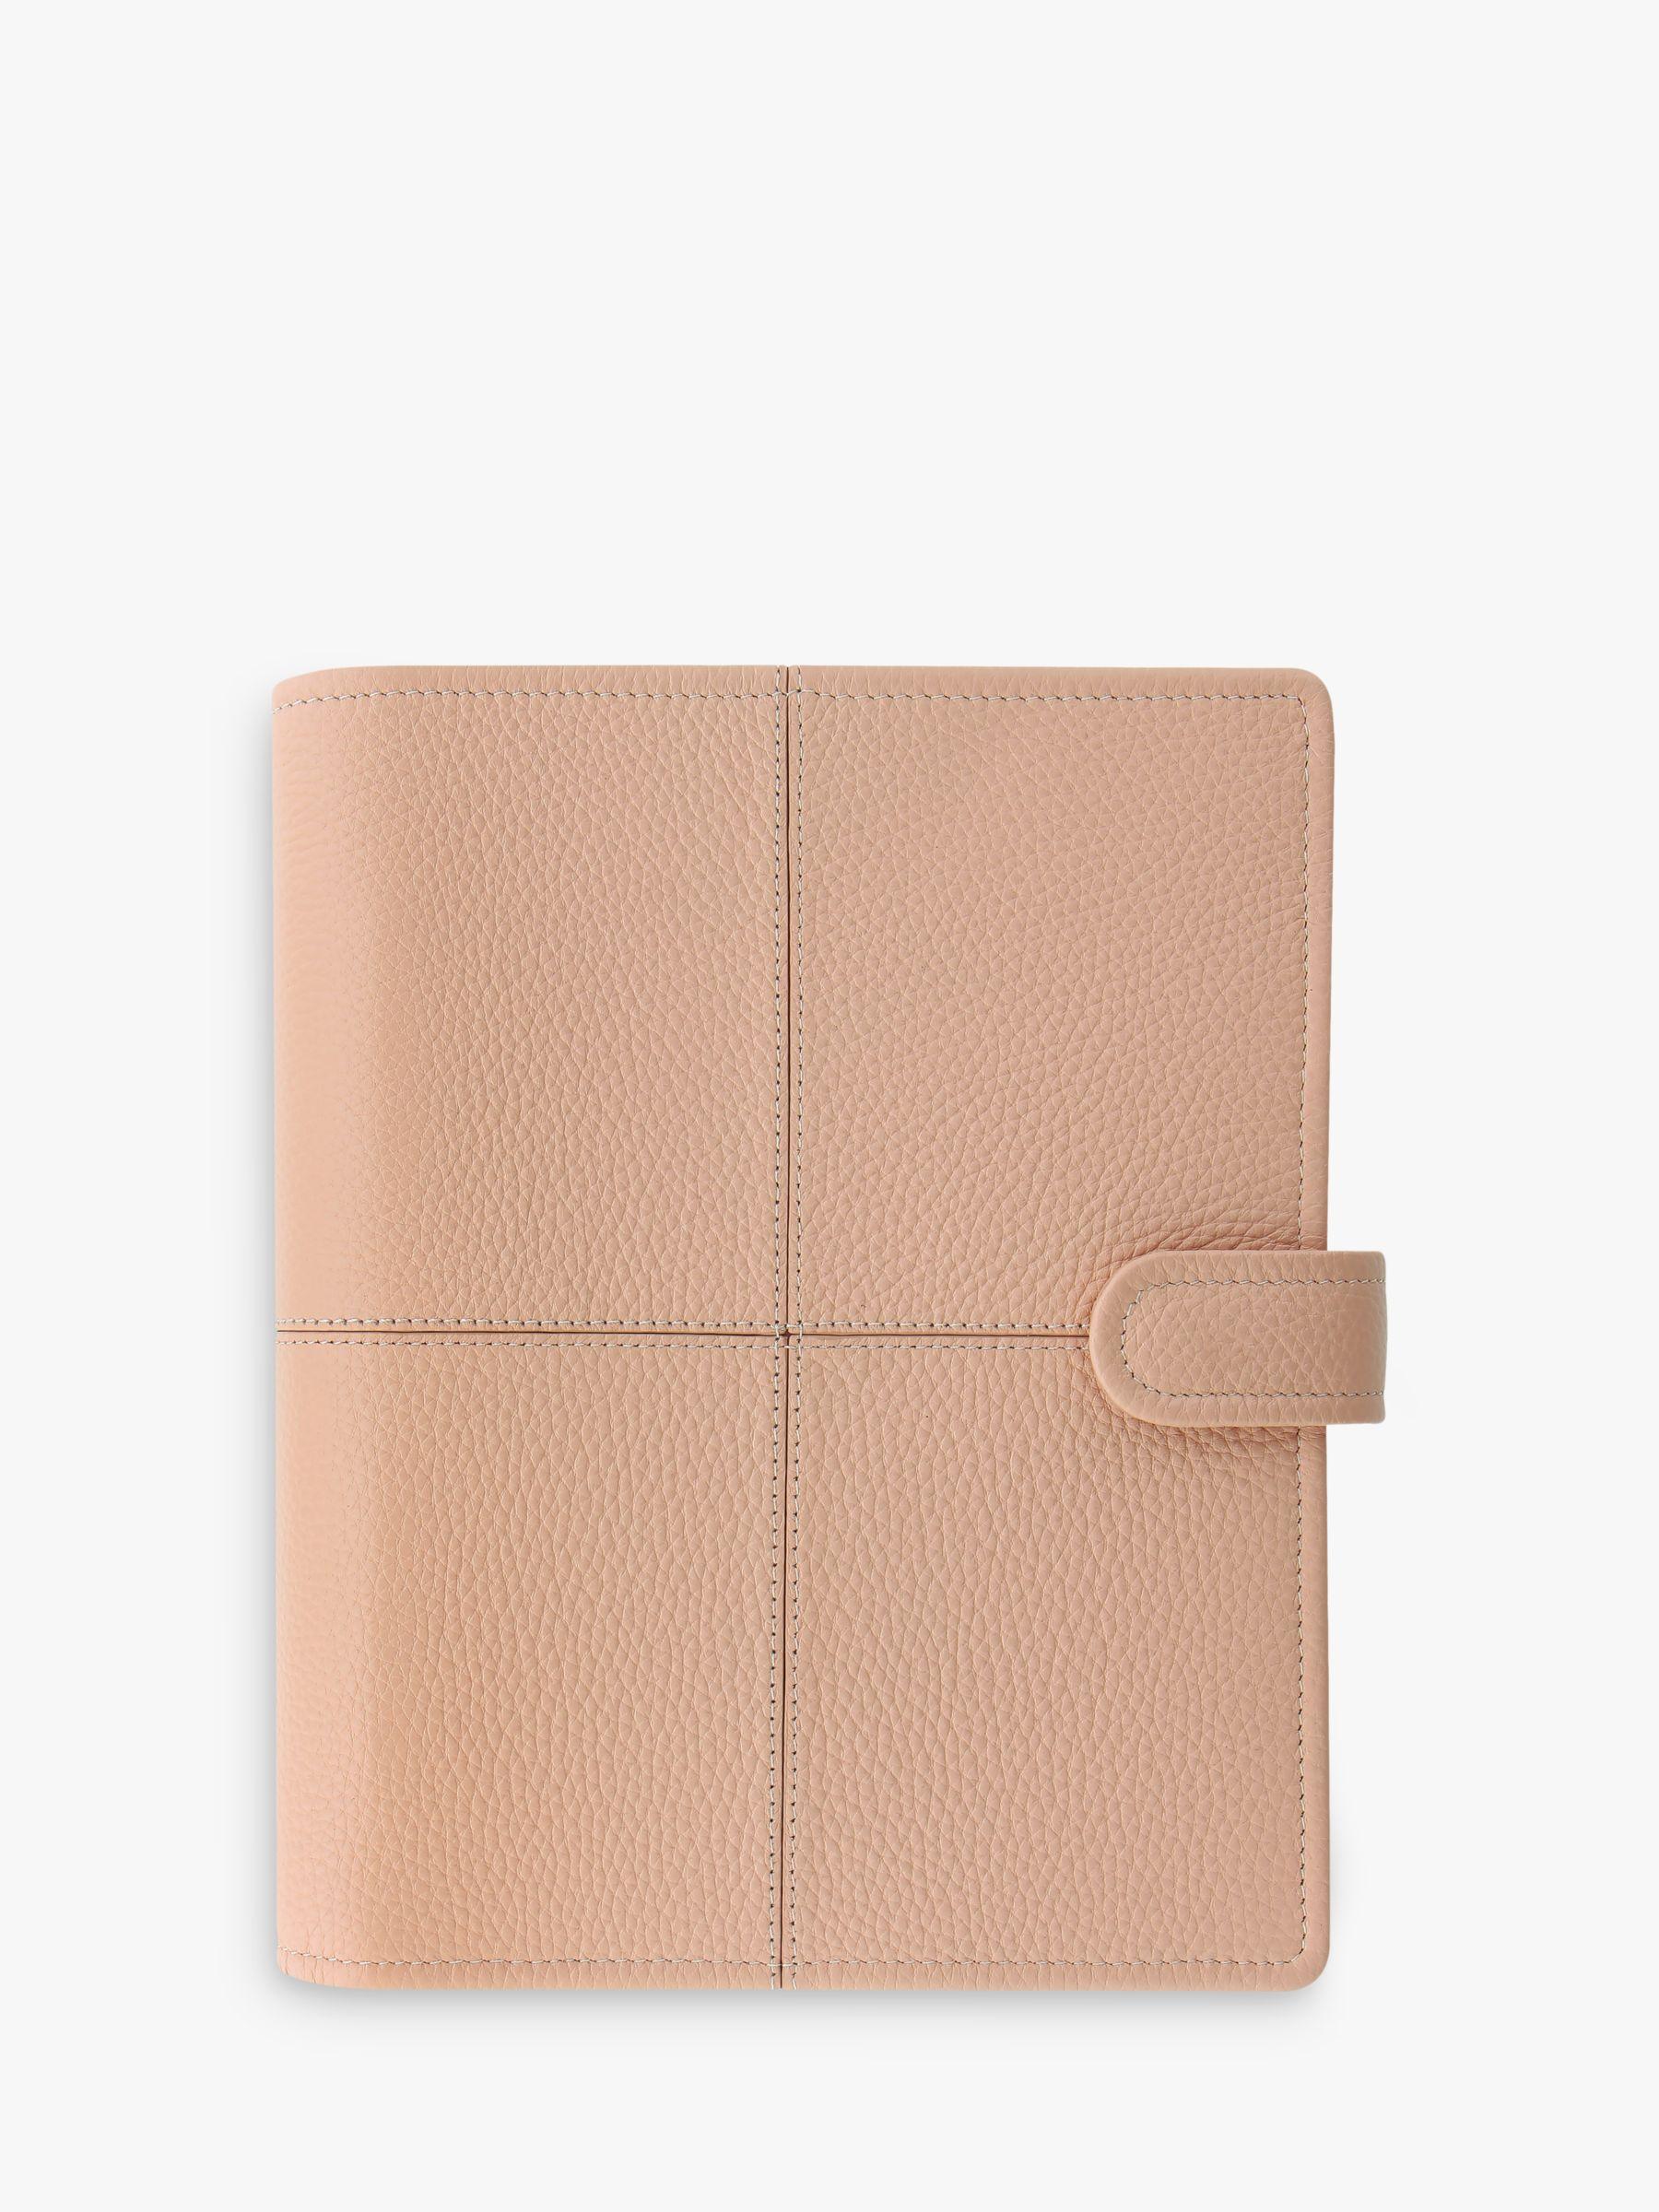 Filofax Filofax Classic Stitch Leather A5 Organiser, Soft Peach